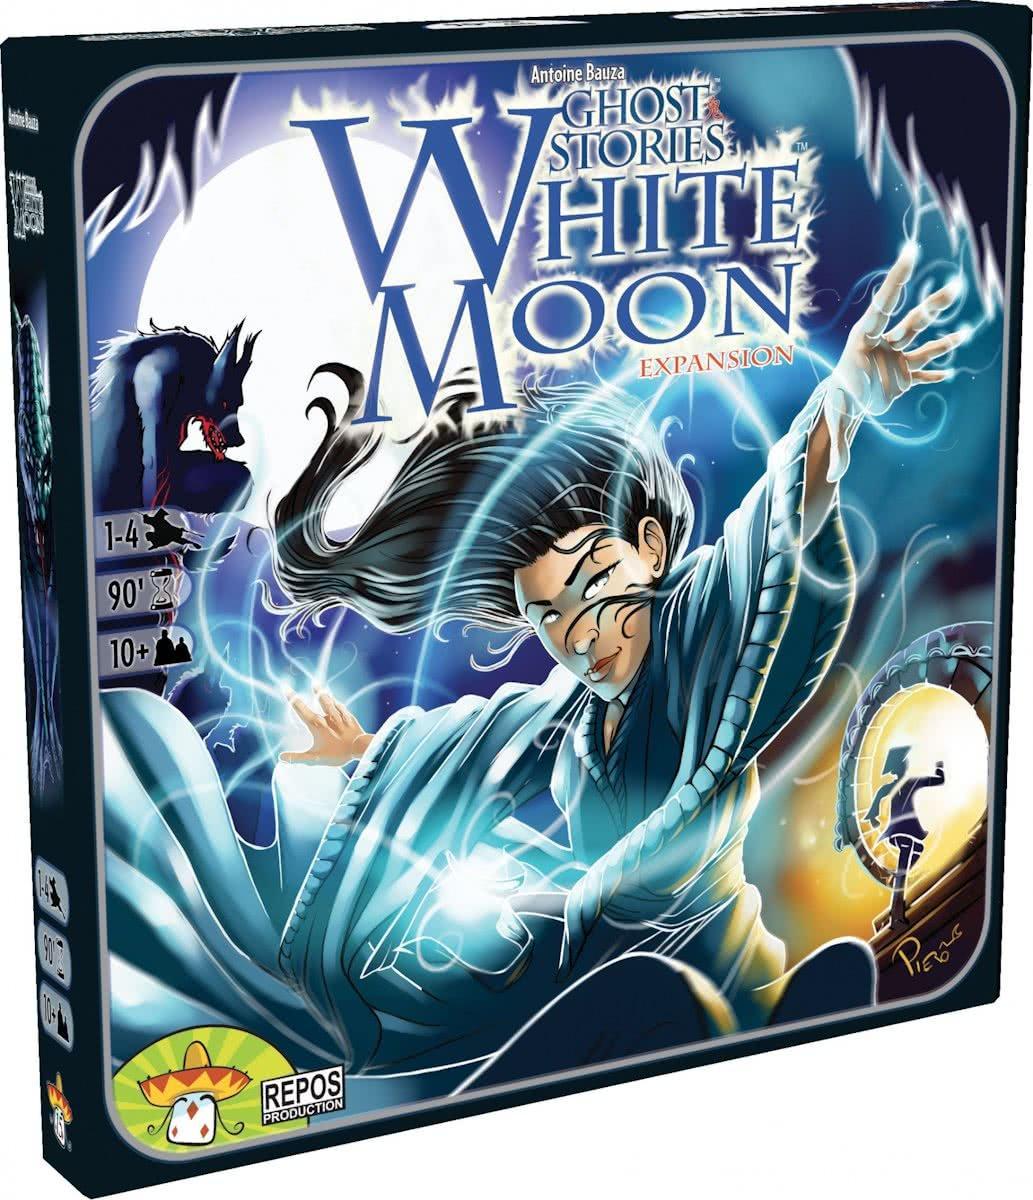 Настольная игра Repos Production Ghost Stories: White Moon Expansion (5425016921609)